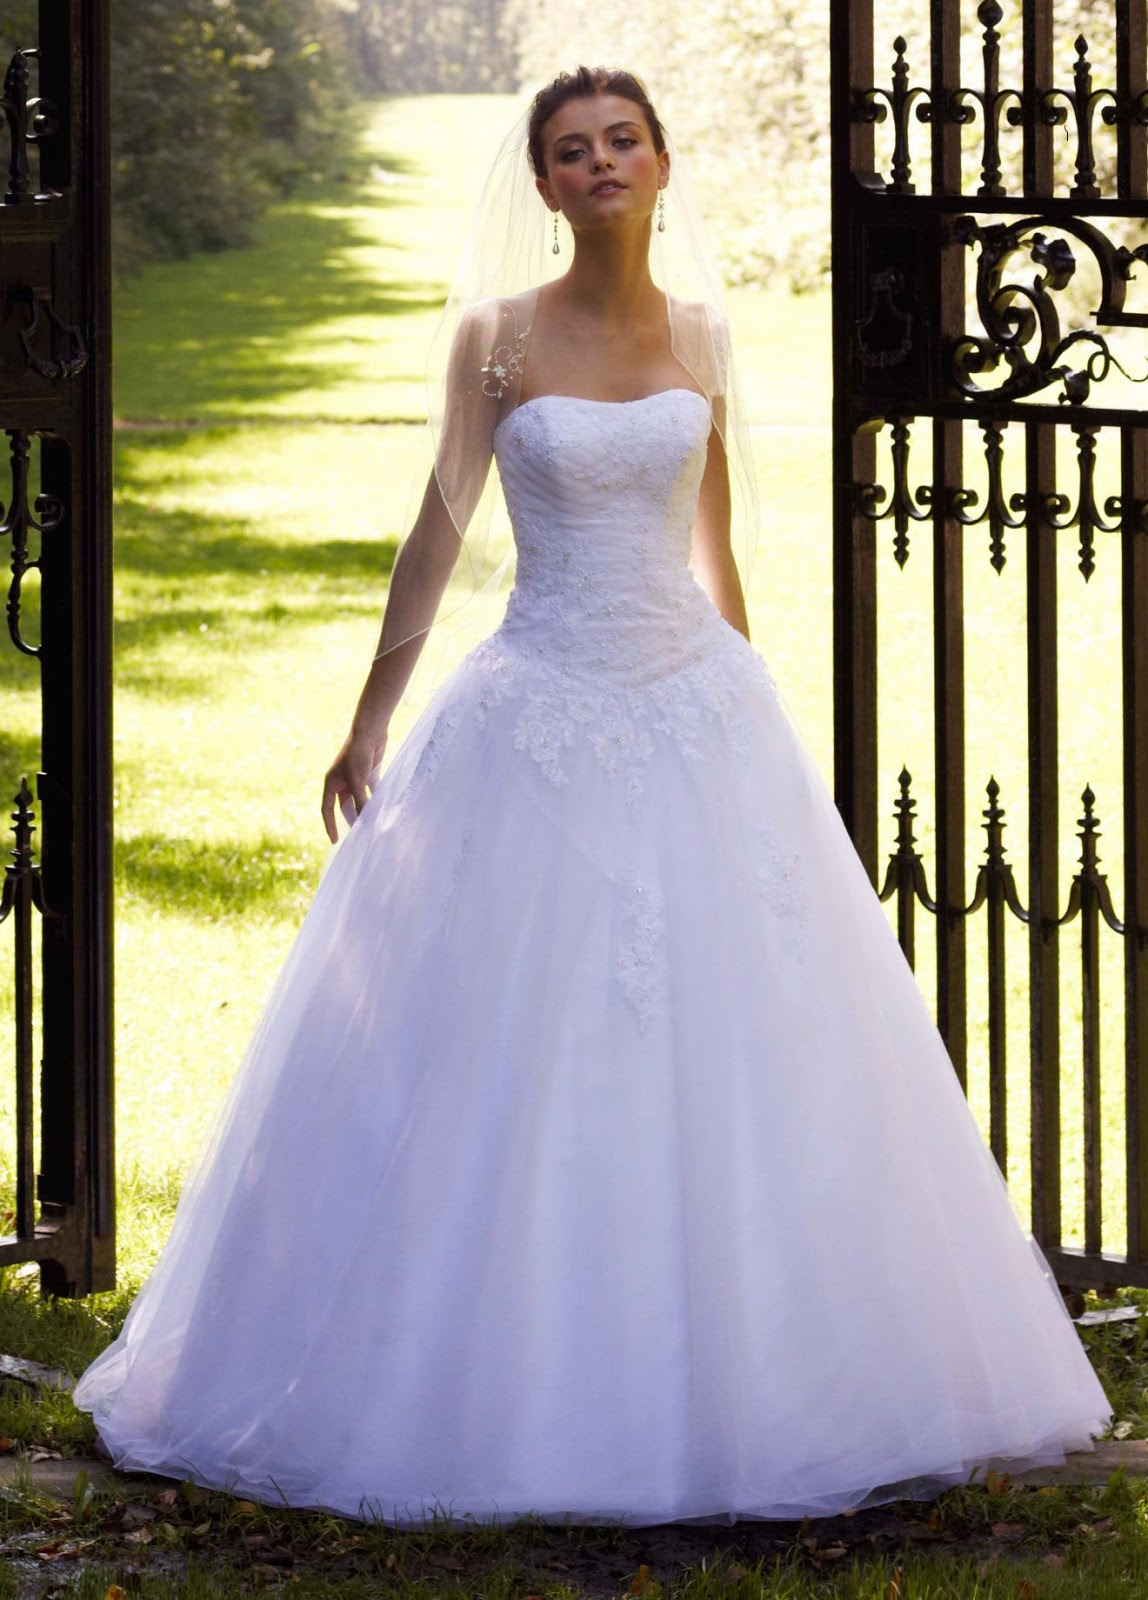 david david s bridal wedding gowns mRPVmXSda e*x ARrQsHHpD*7cgXzpVNc 7CUtBJsYGVOg davids bridal wedding dresses Wedding Dresses And Trends David s Bridal Collection